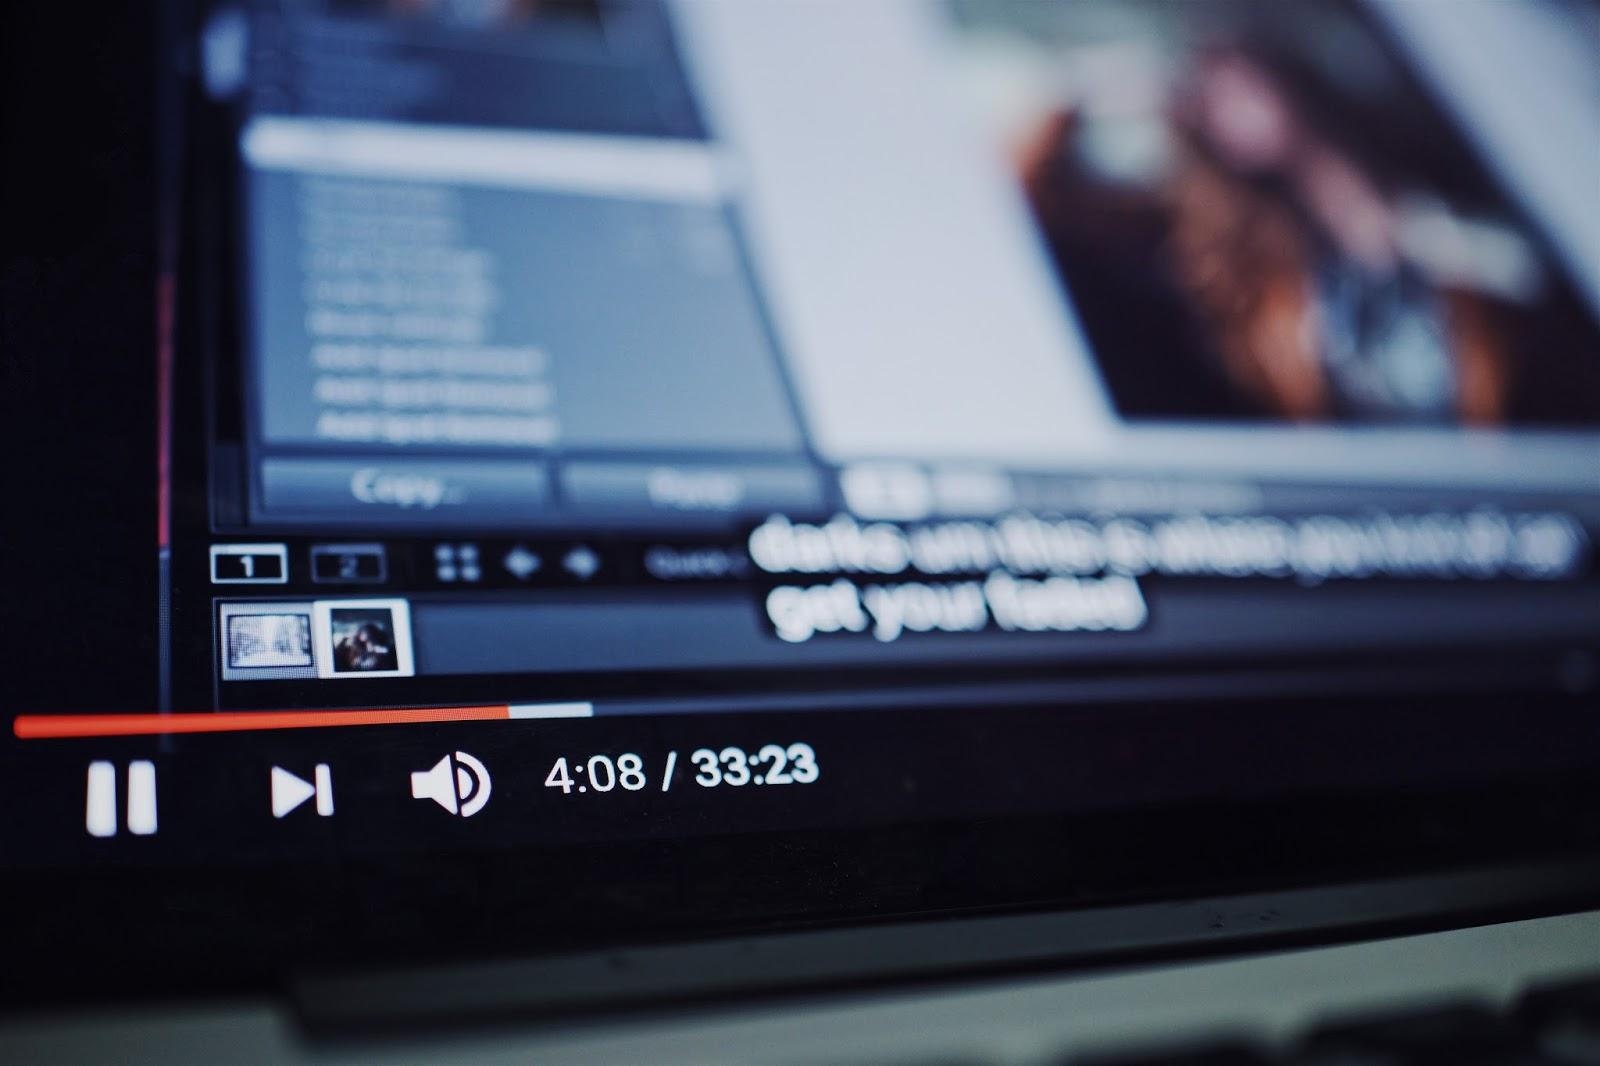 Youtube: 1.8 δις συνδεδεμένοι χρήστες παρακολουθούν τα βίντεο κάθε μήνα